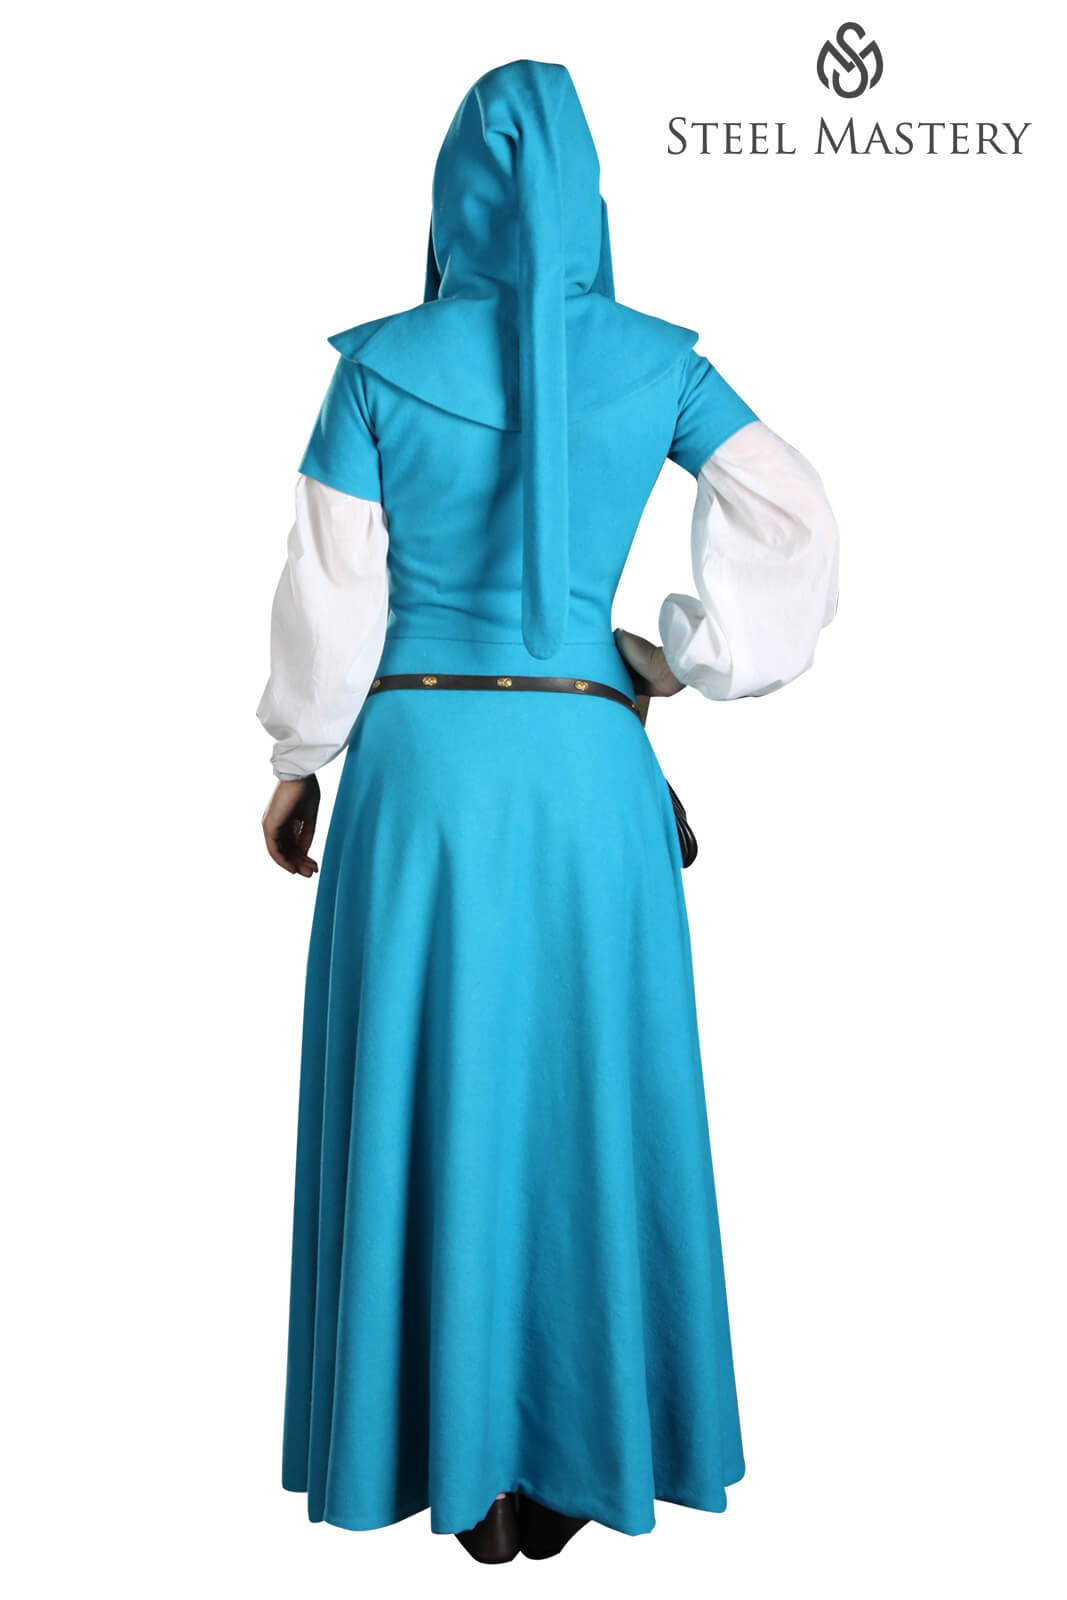 Kirtle, European dress of XV century